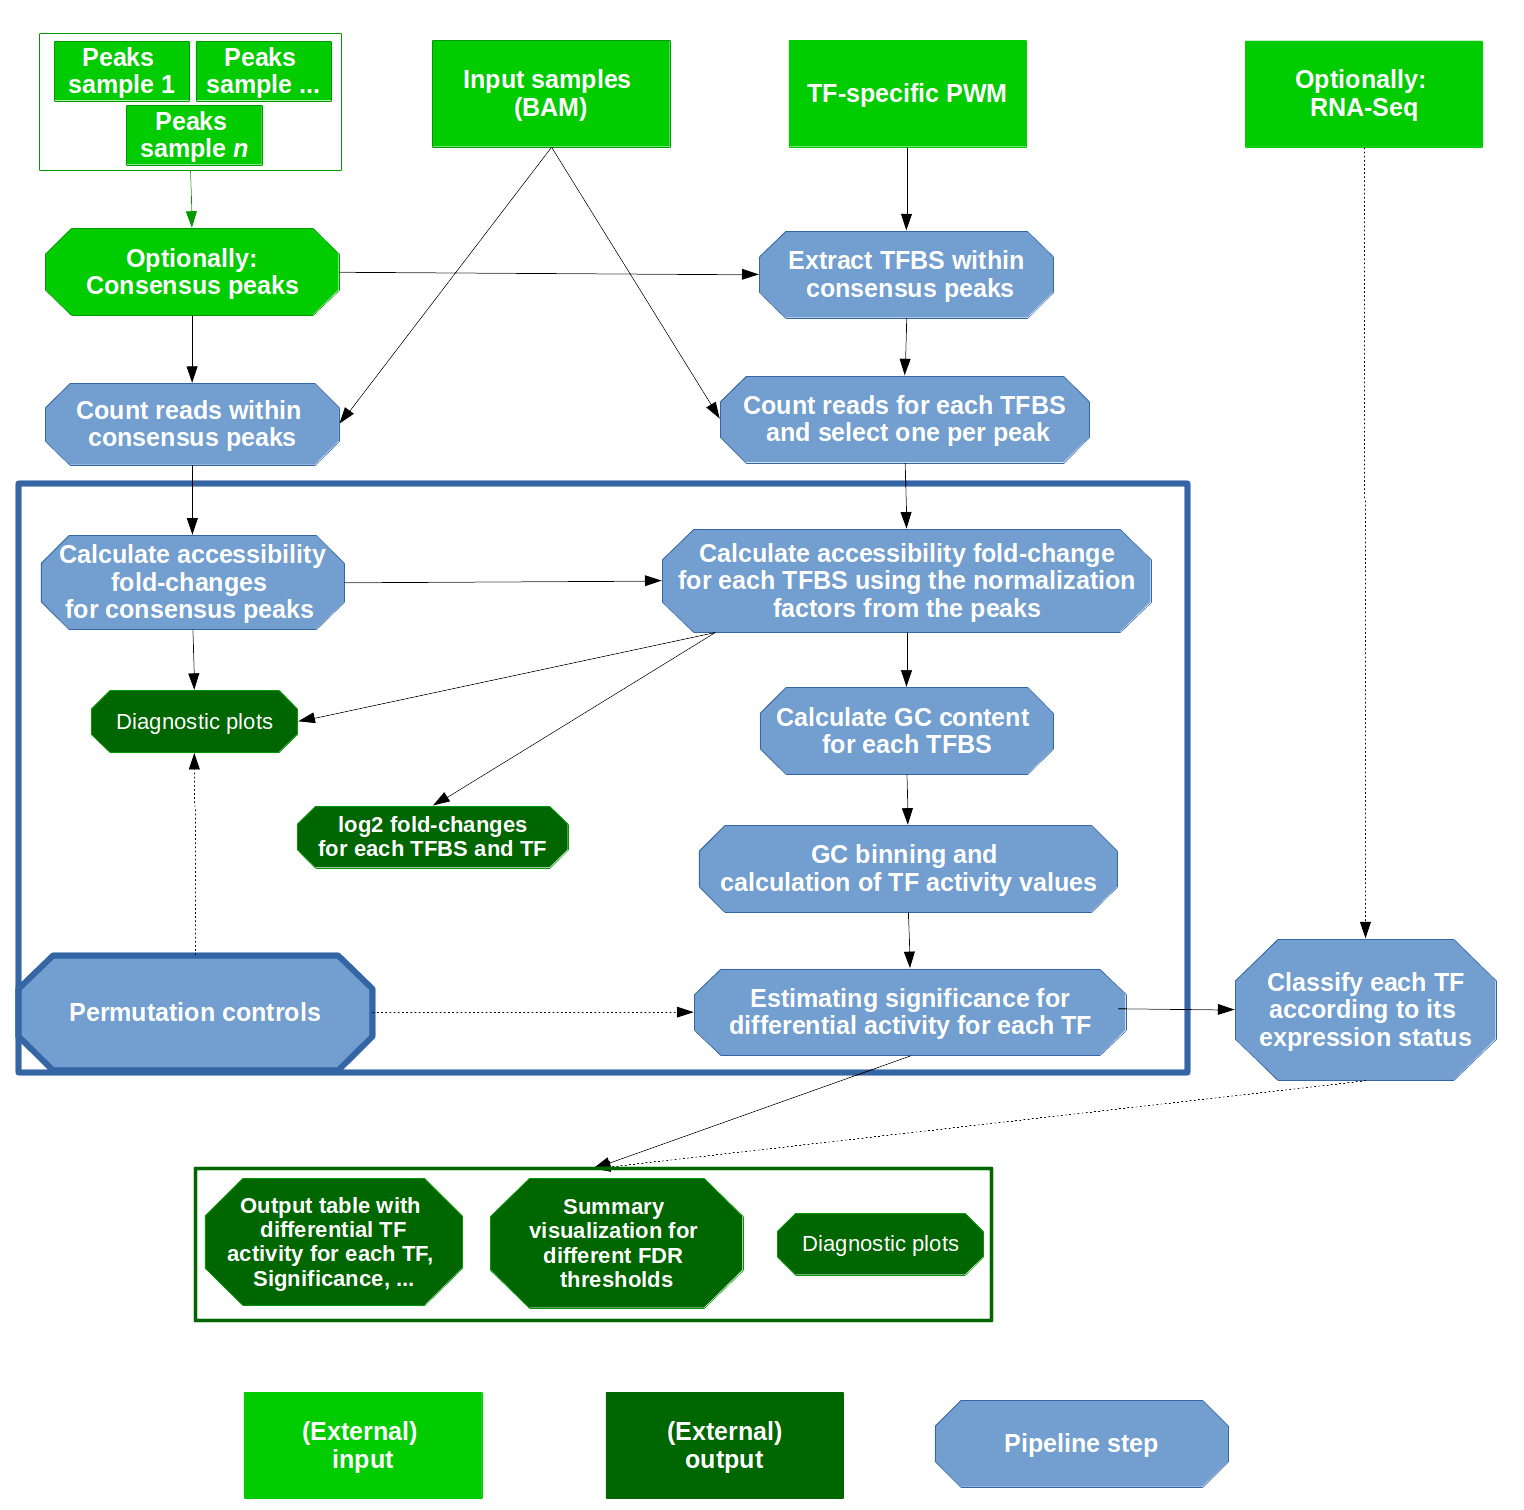 docs/_build/html/_images/Workflow_transparent.png